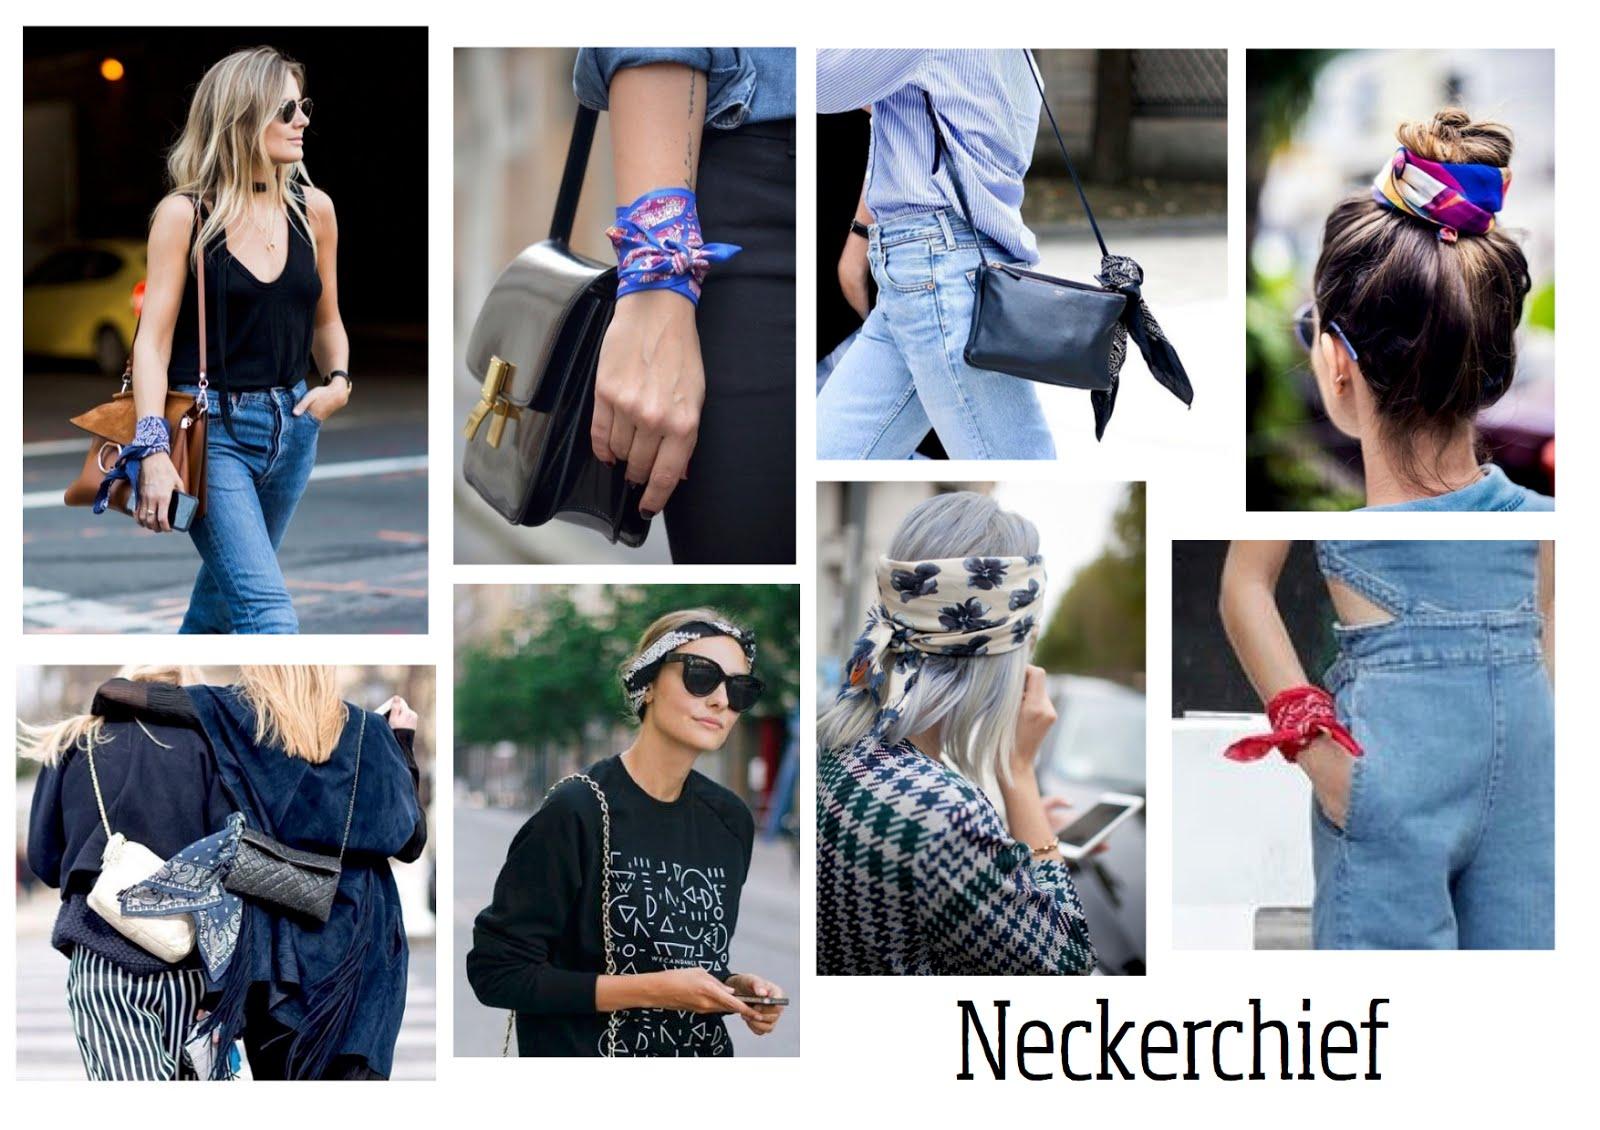 Tee-Clutter: Neckerchief